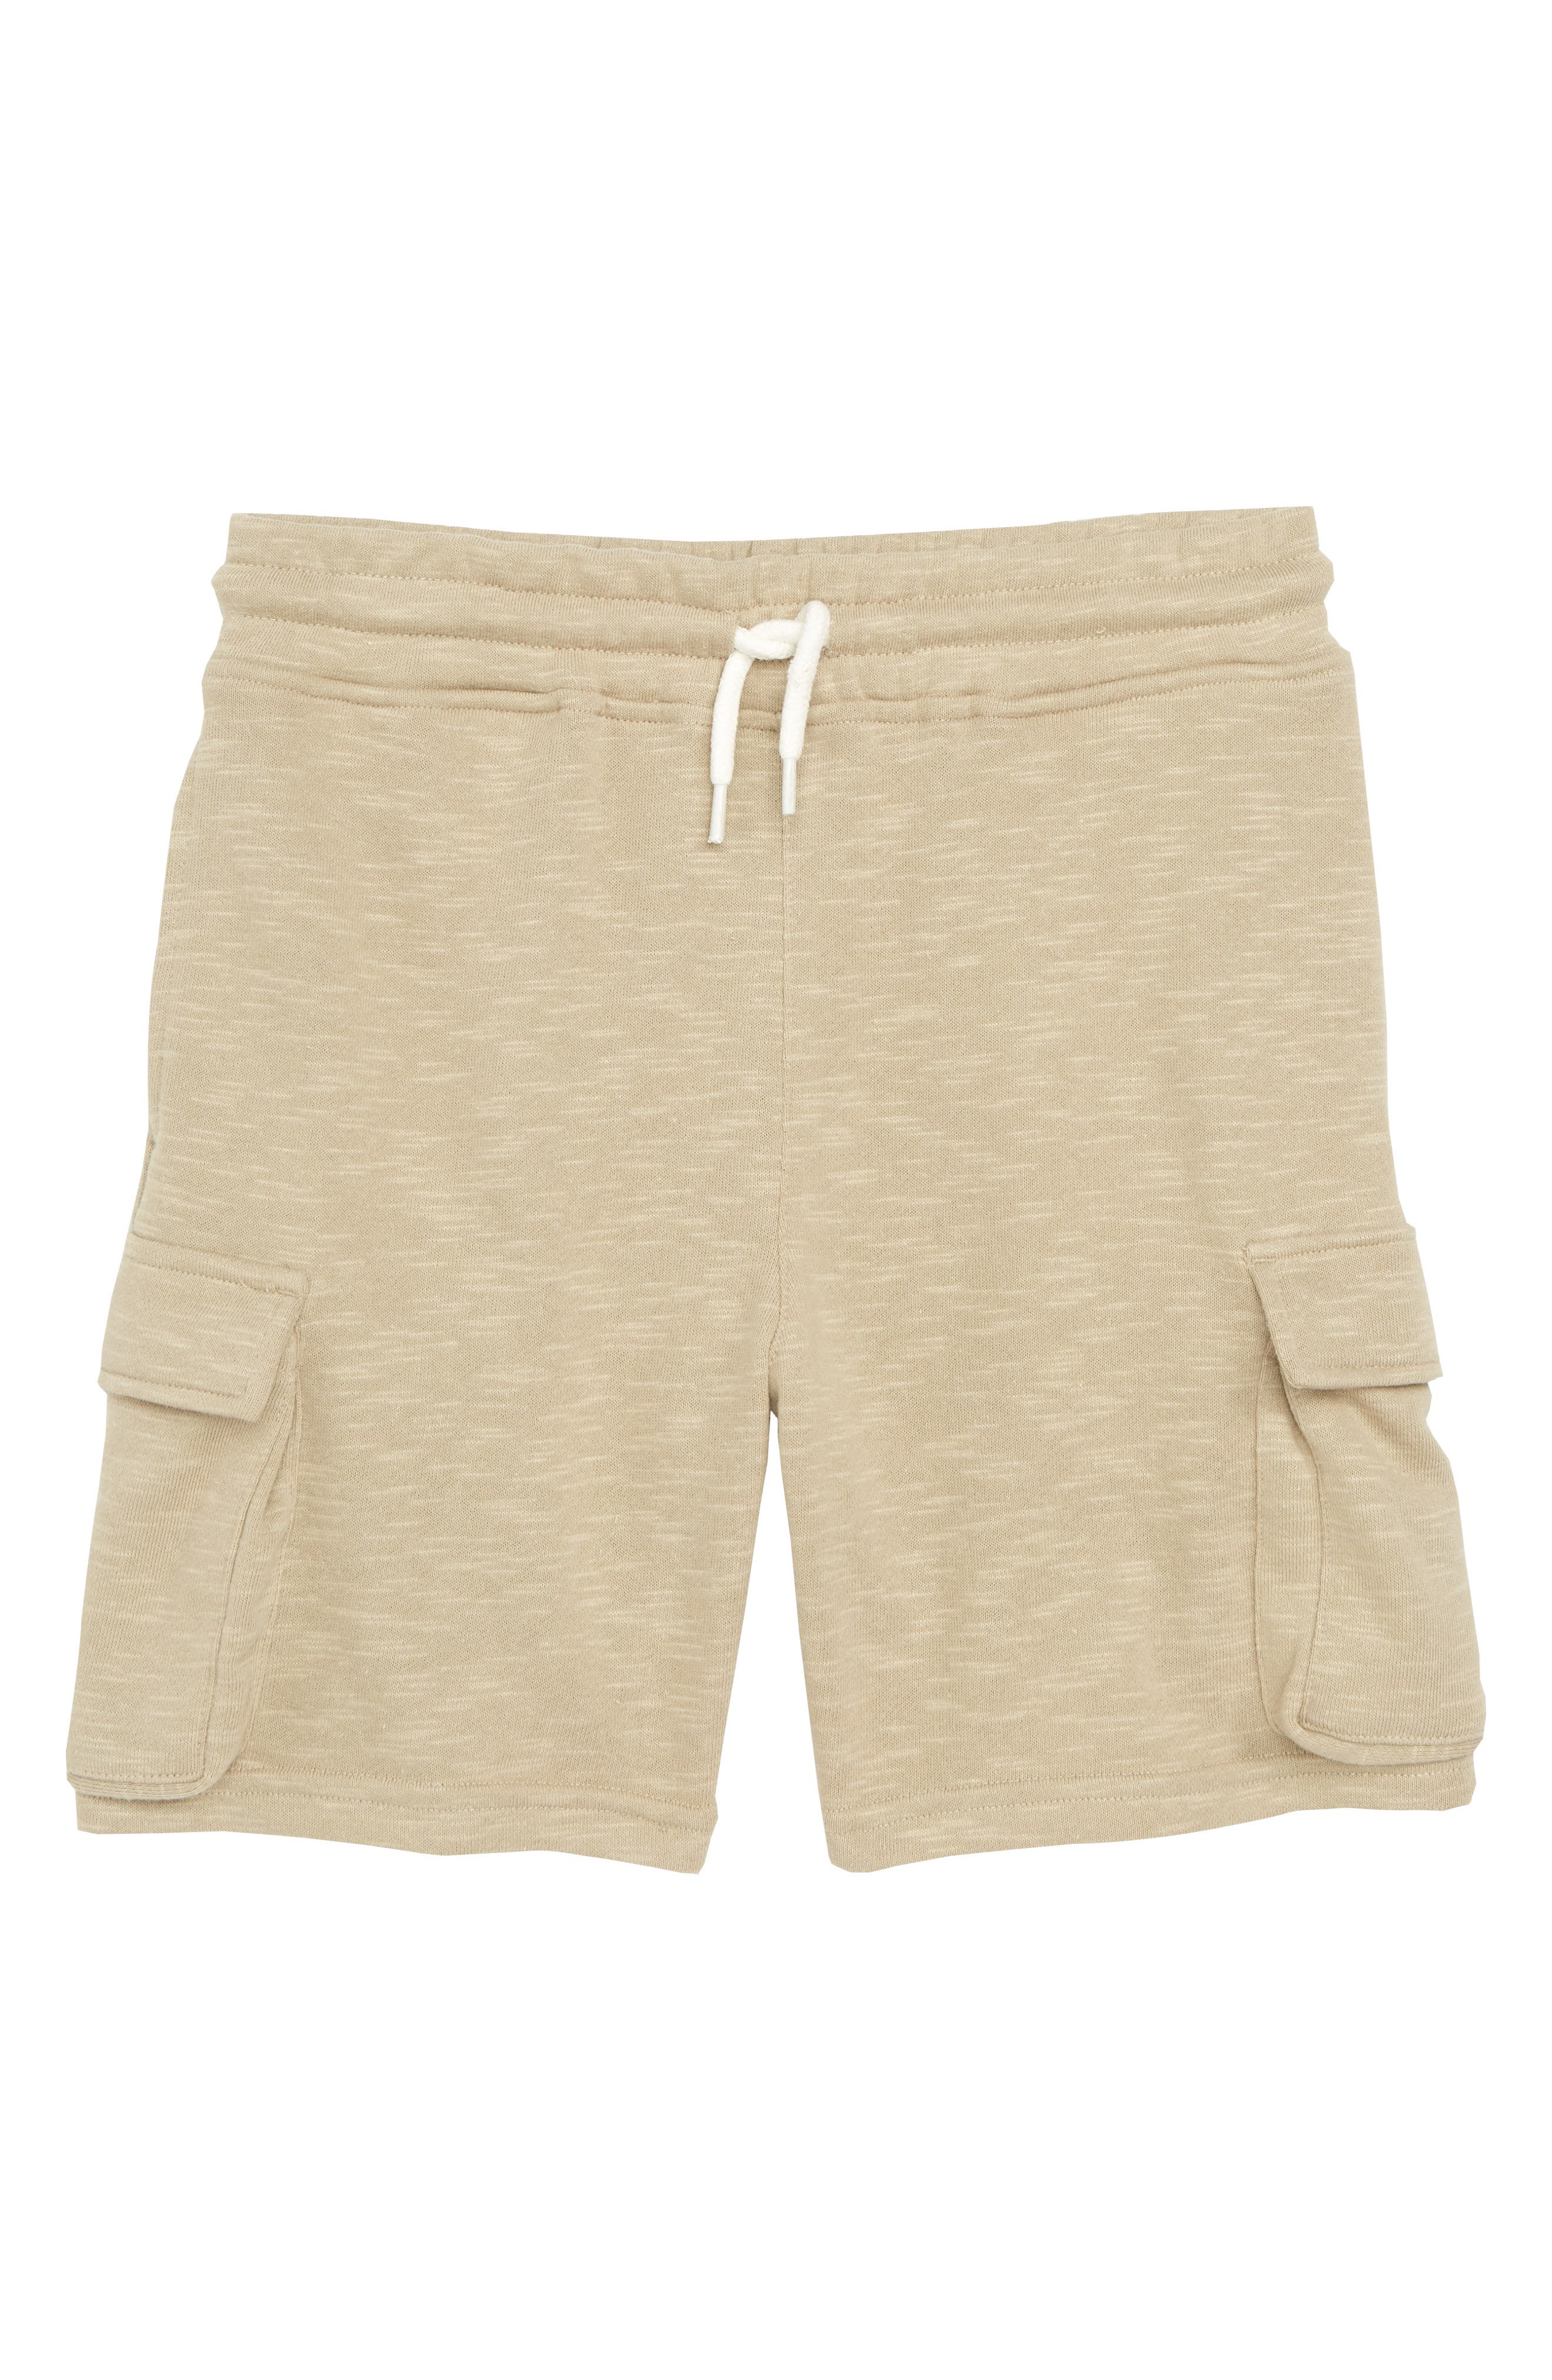 Elwood Cargo Shorts,                             Main thumbnail 1, color,                             250